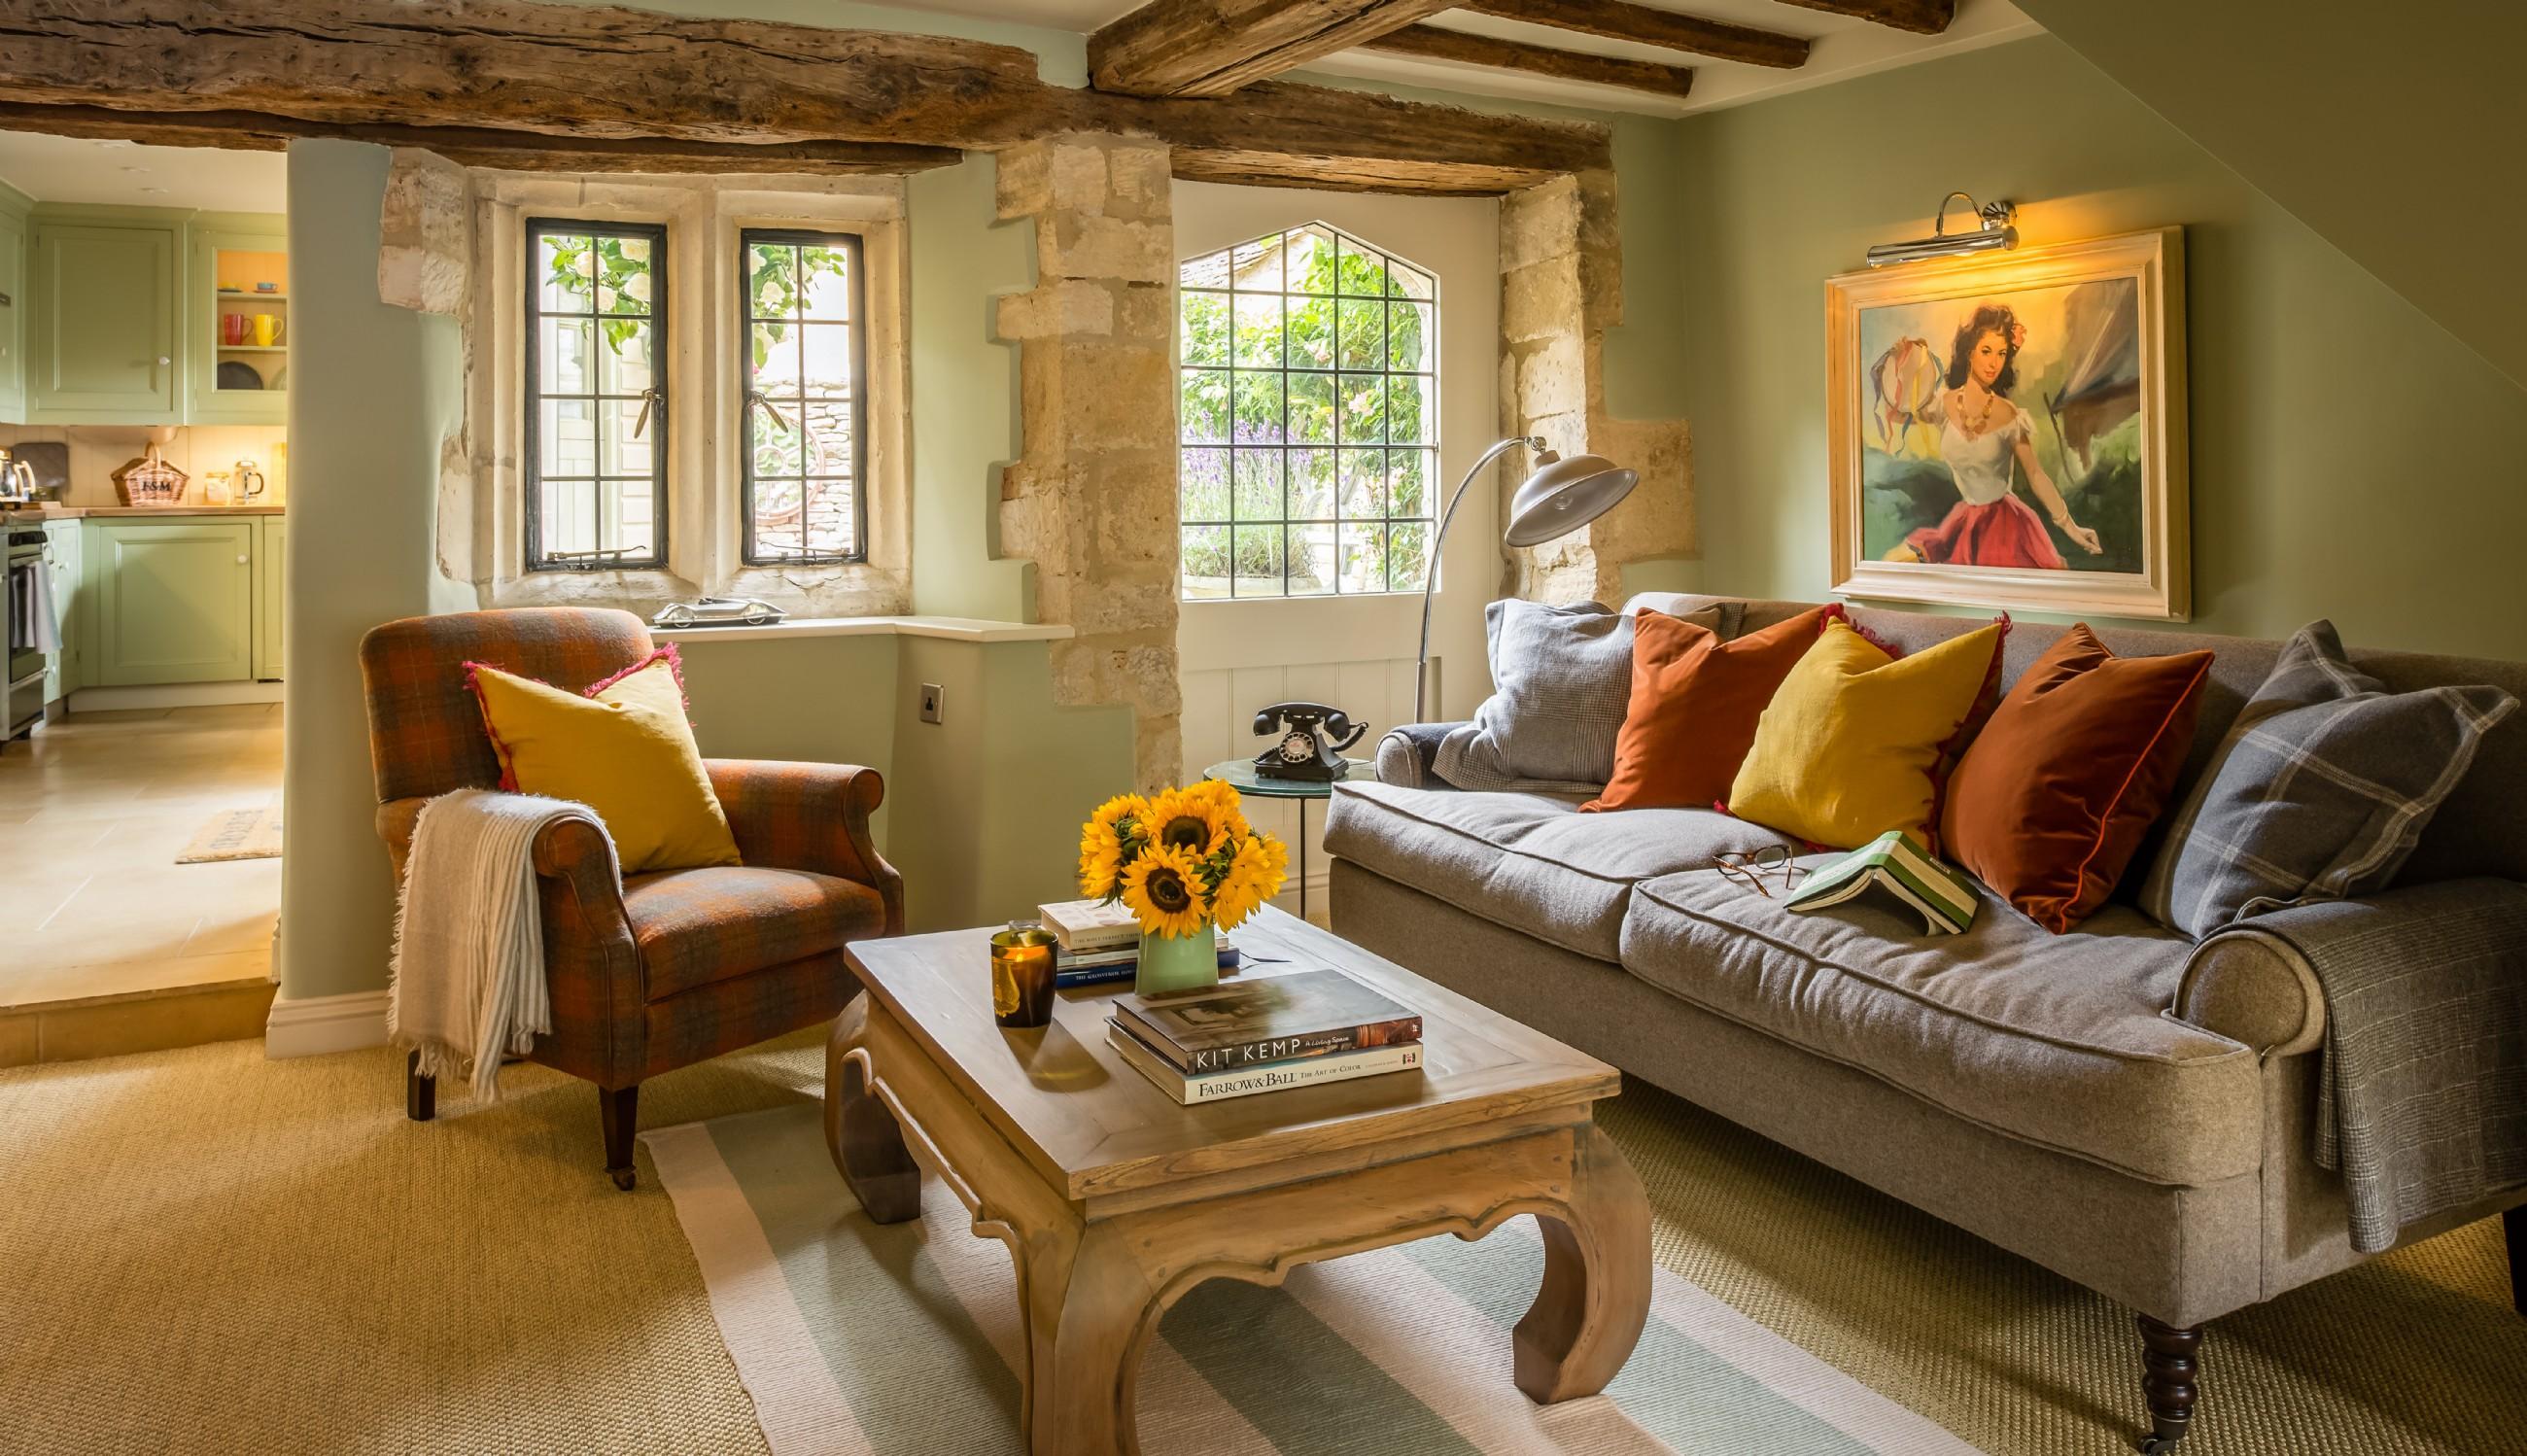 Tremendous Little Scarlet Luxury Self Catering Cottage Burford Interior Design Ideas Gentotryabchikinfo